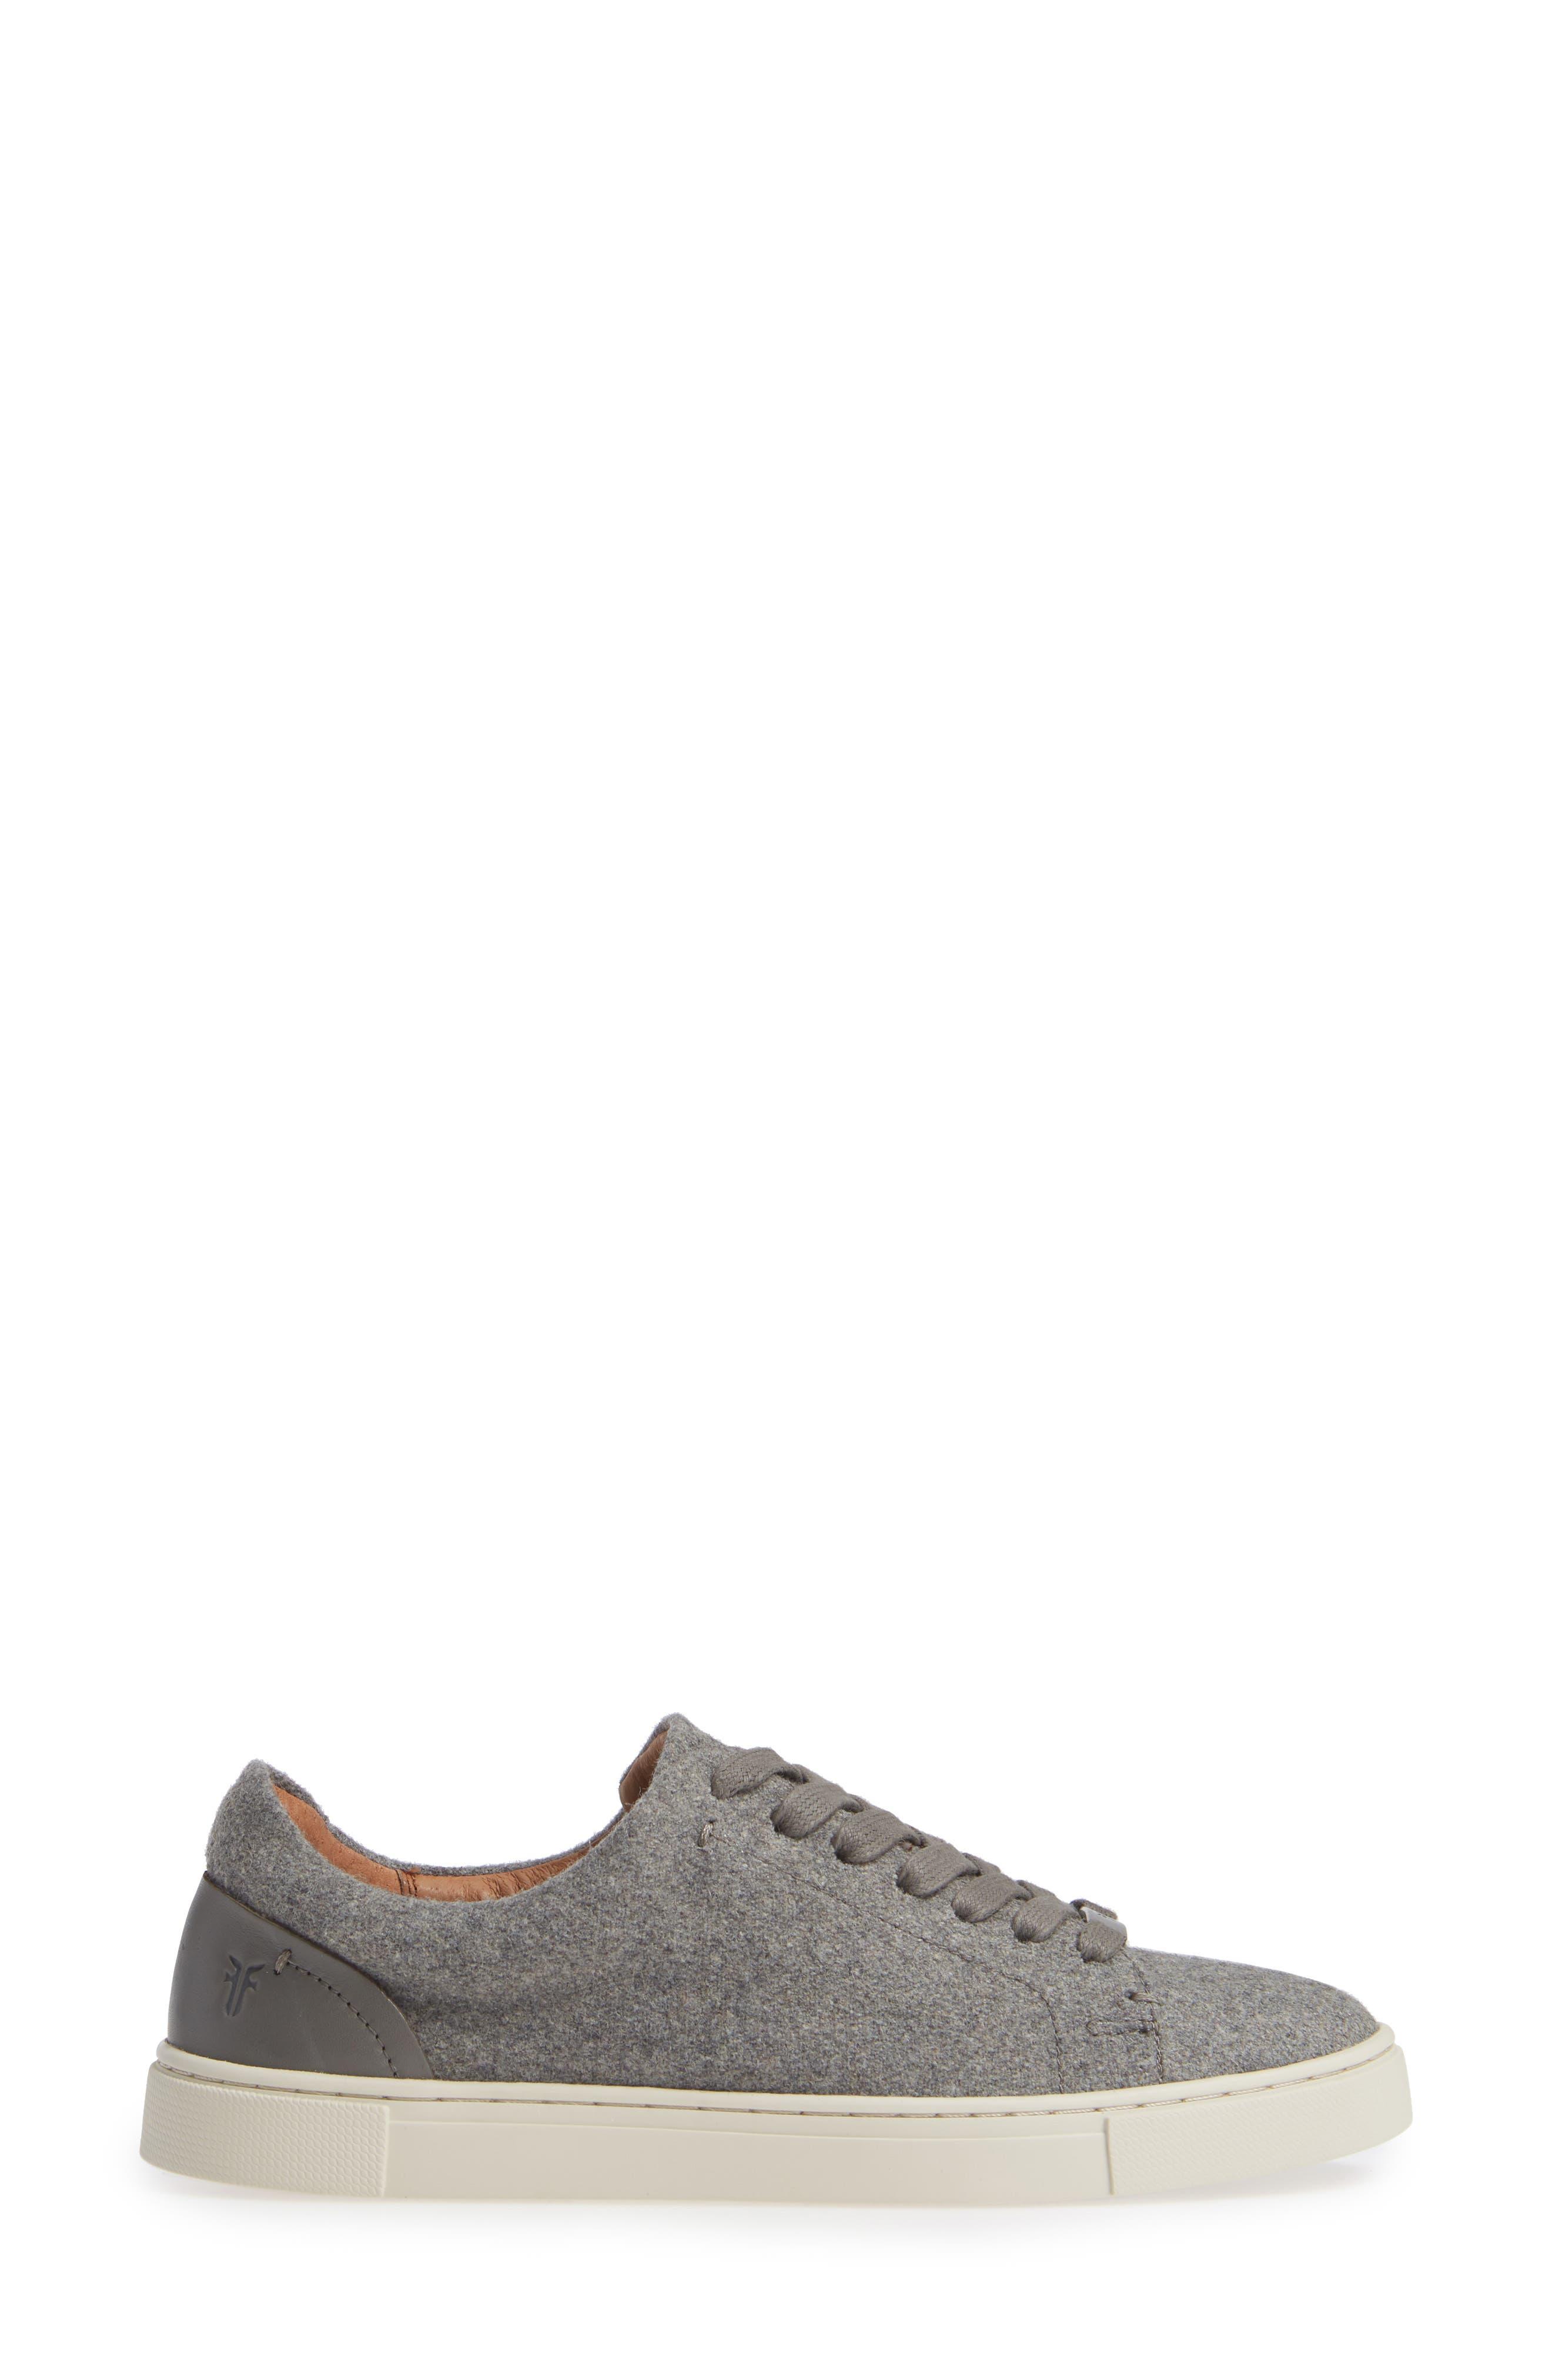 Ivy Sneaker,                             Alternate thumbnail 3, color,                             GREY WOOL FABRIC